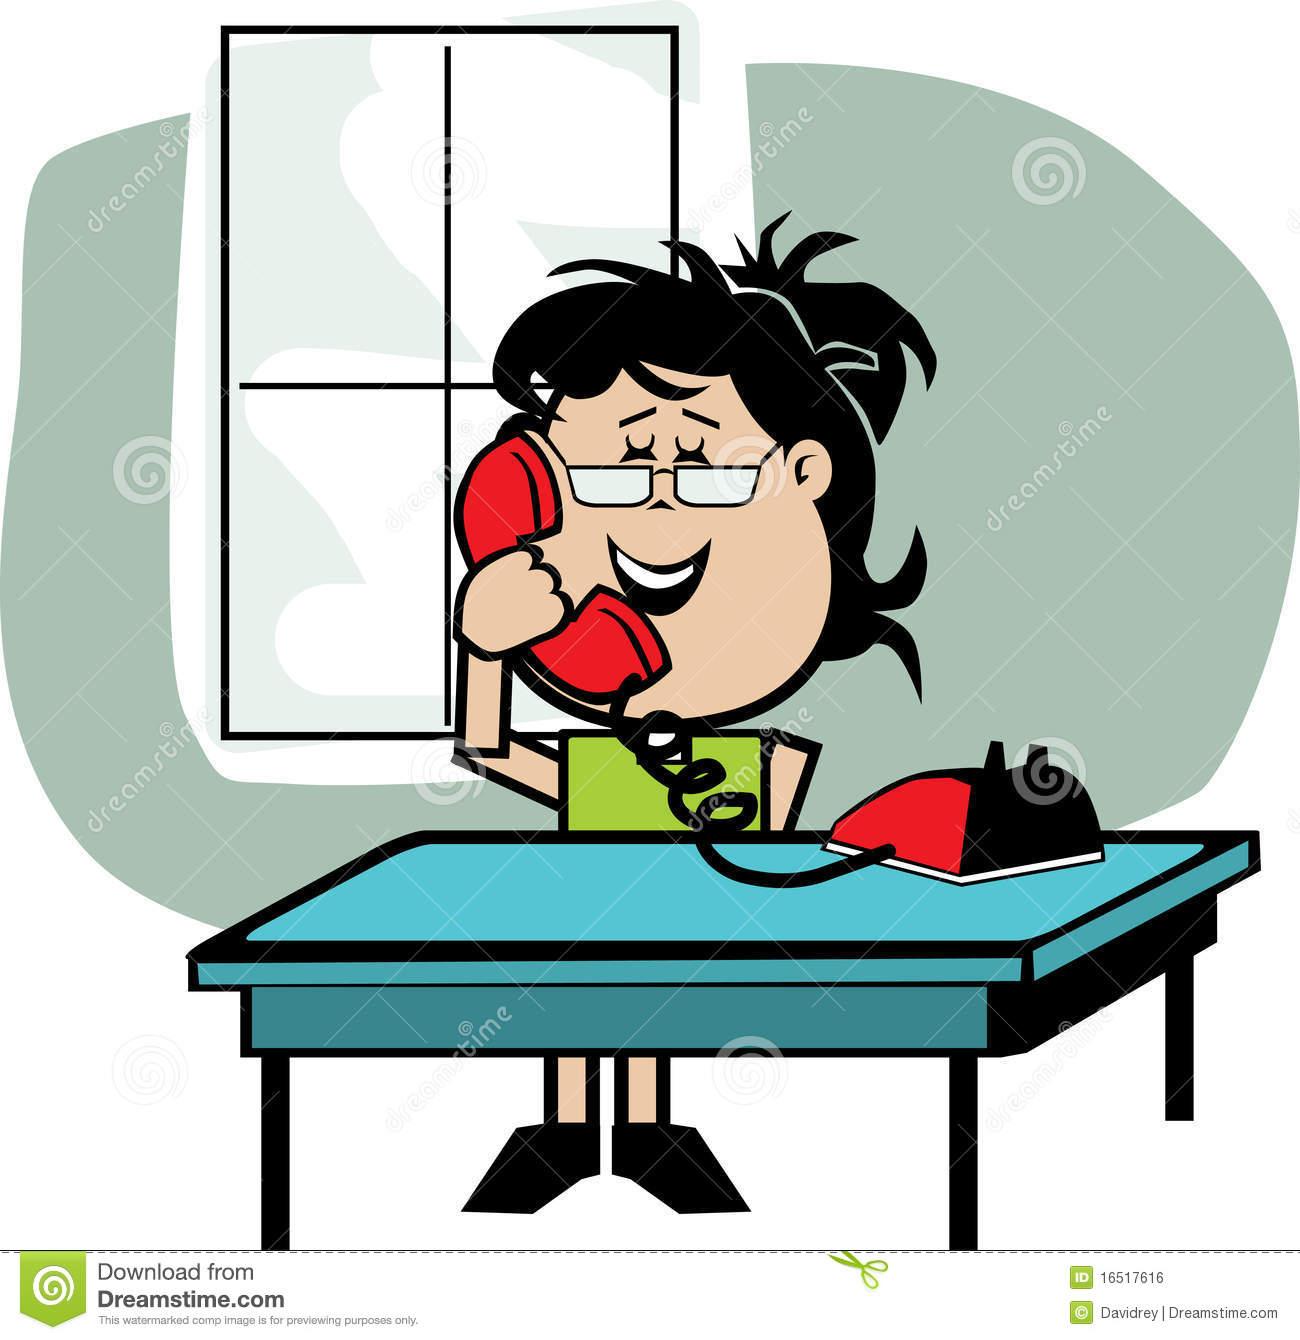 Secretary on the phone stock vector. Illustration of secretary.